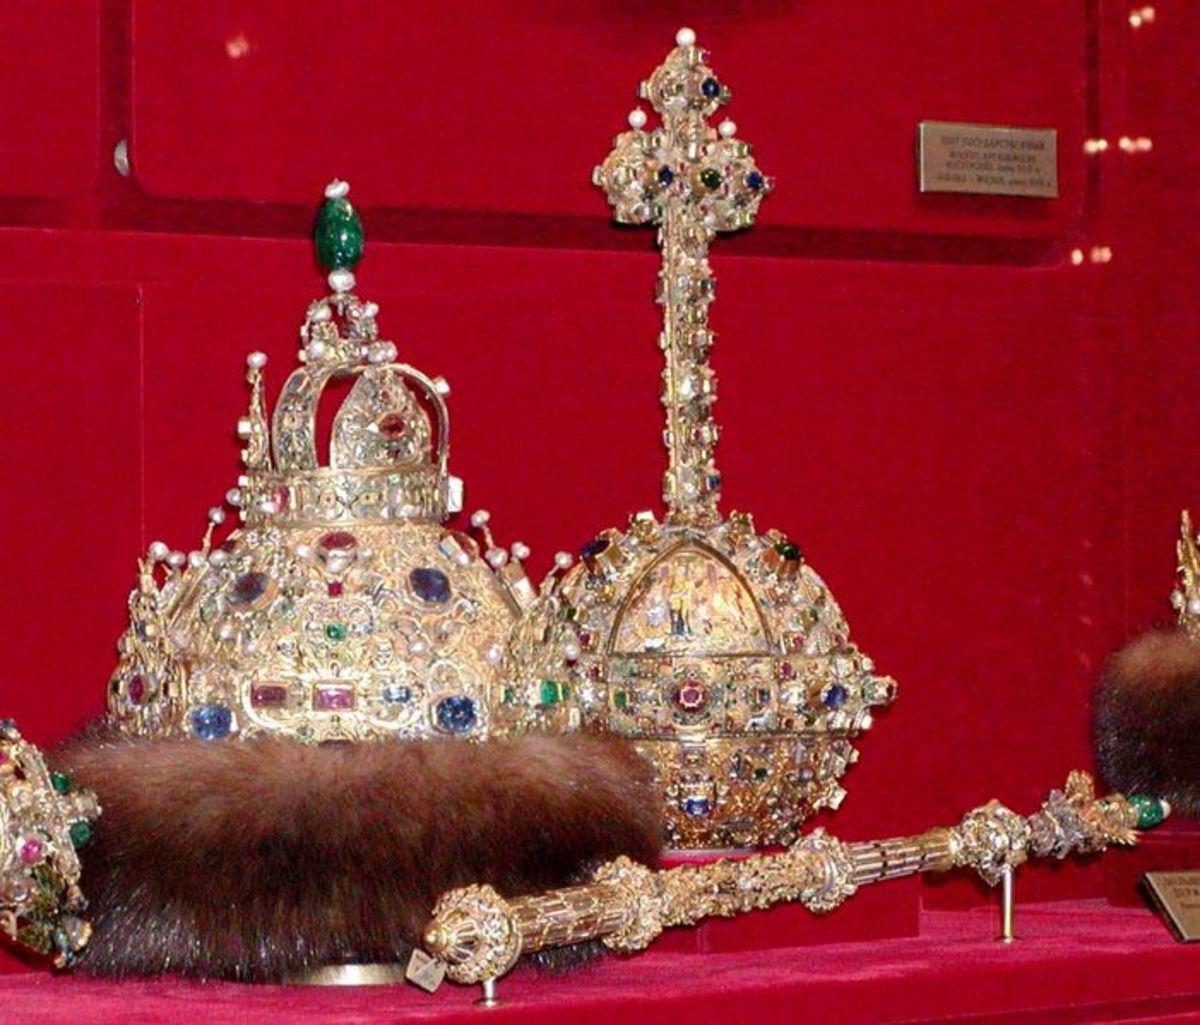 Russian Tsarist regalia at the Kremlin in Moscow